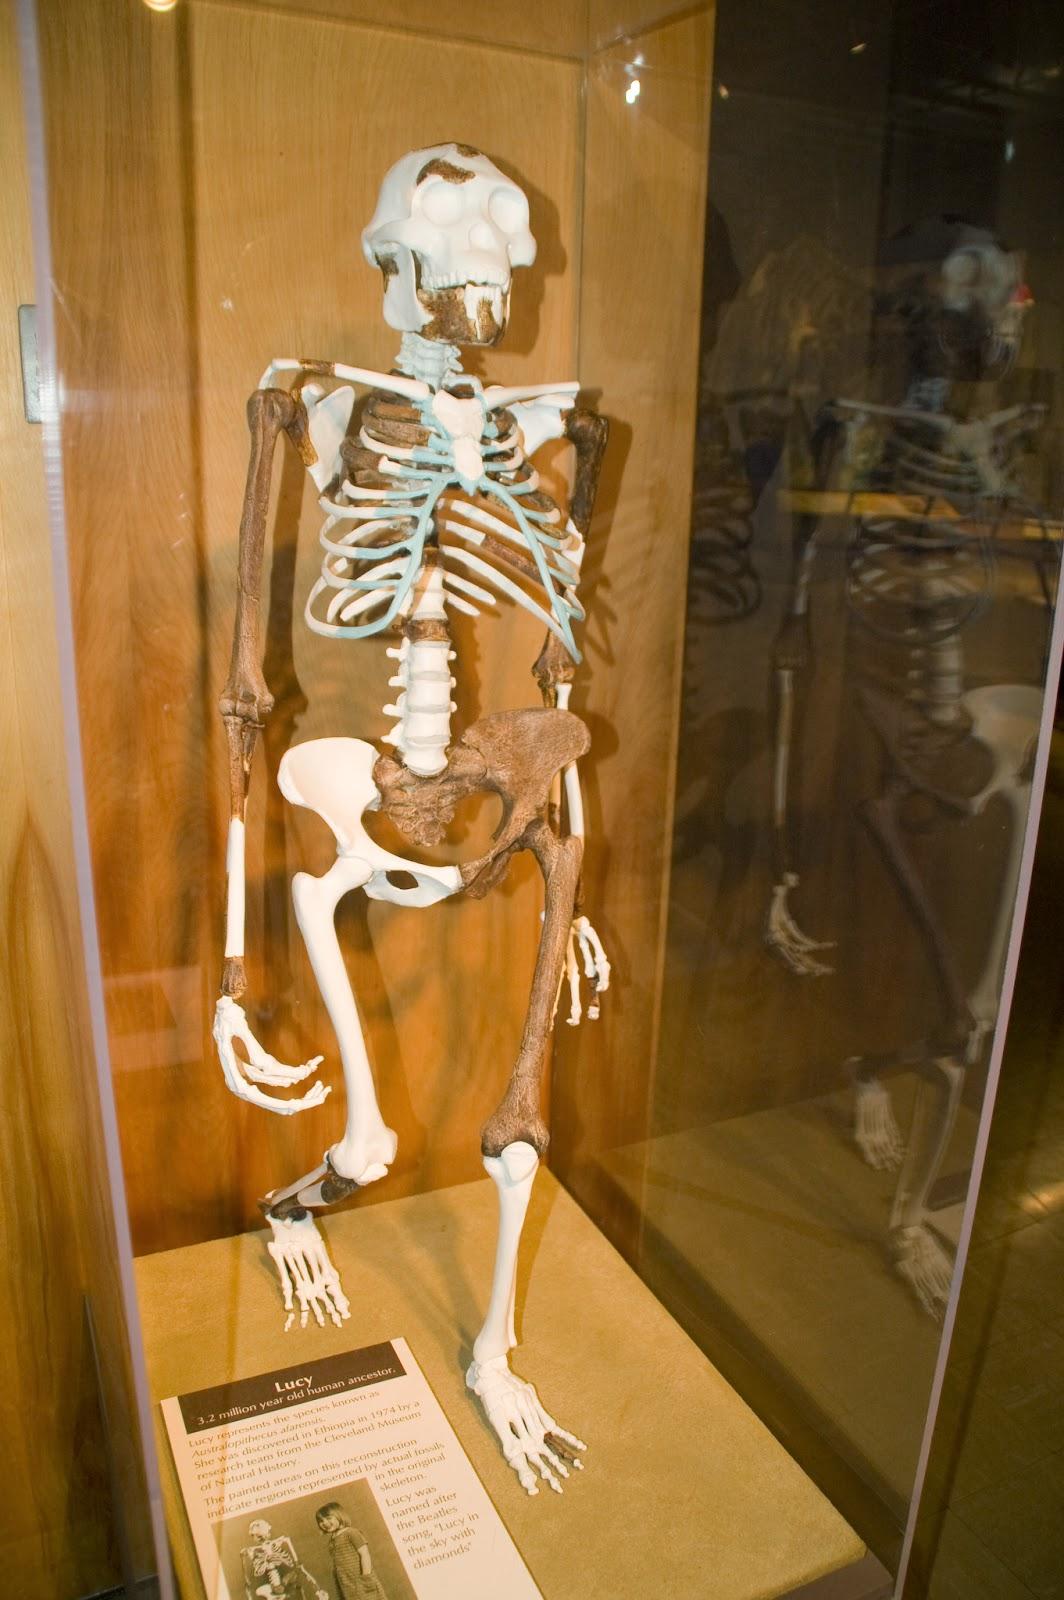 Australopithecus afarensis - Storie di Scienza di Giovanni Boaga